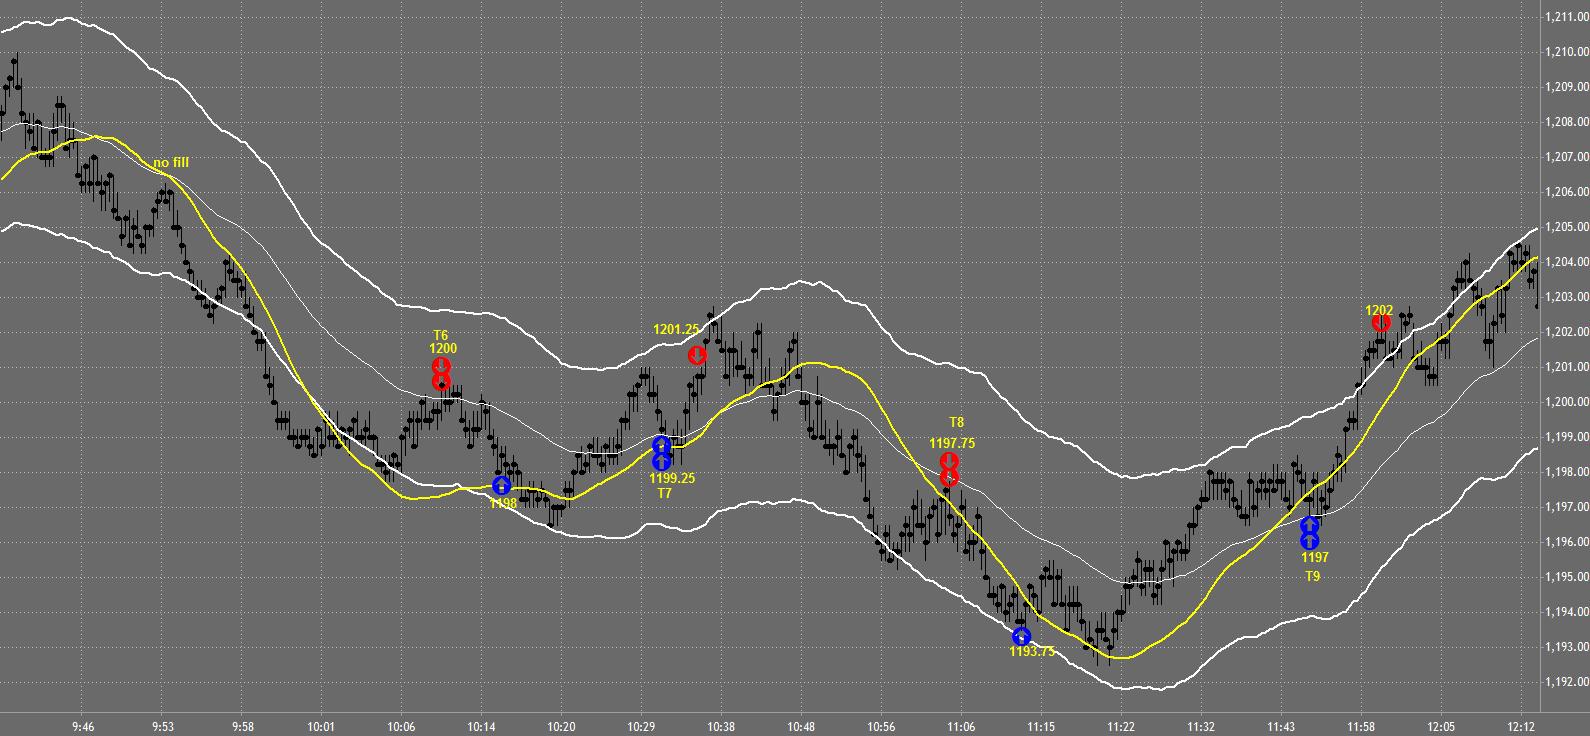 Tradestation Charts, day trading charts, day trading chart